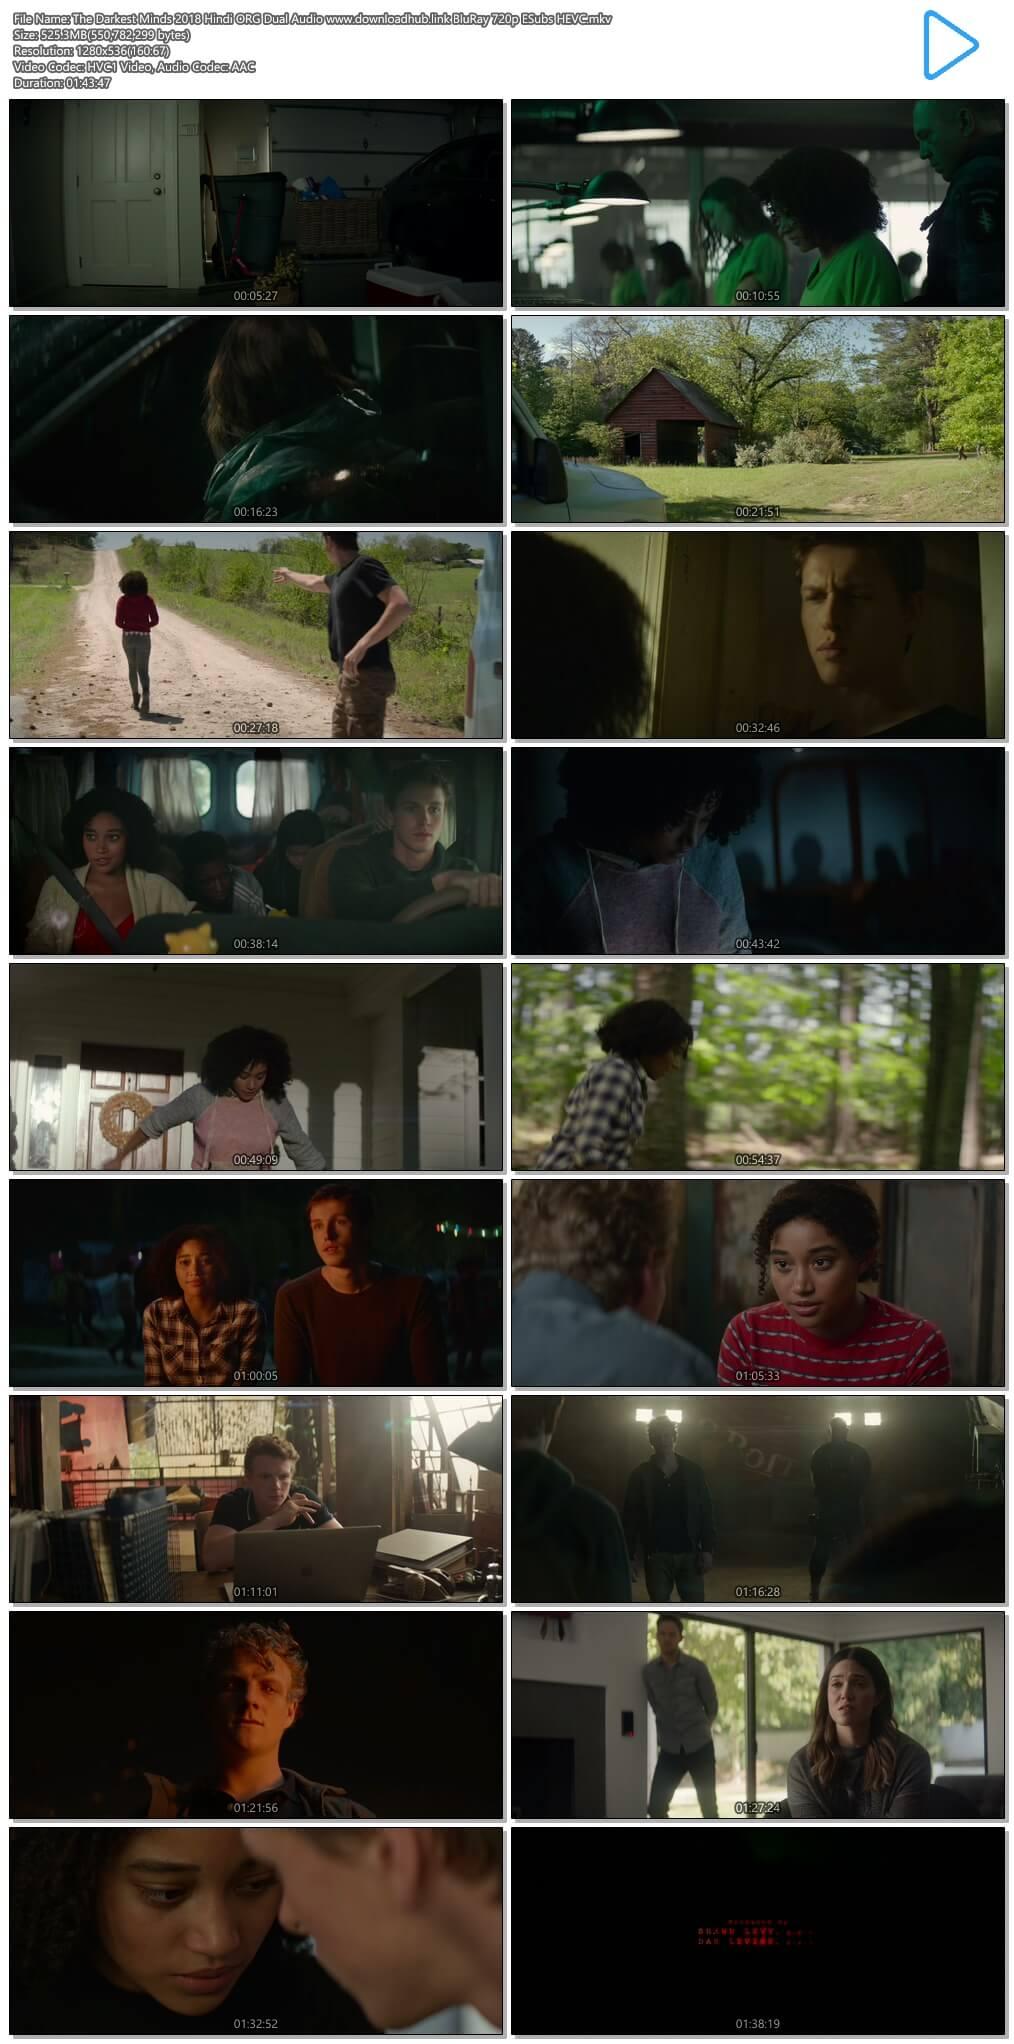 The Darkest Minds 2018 Hindi ORG Dual Audio 500MB BluRay 720p ESubs HEVC